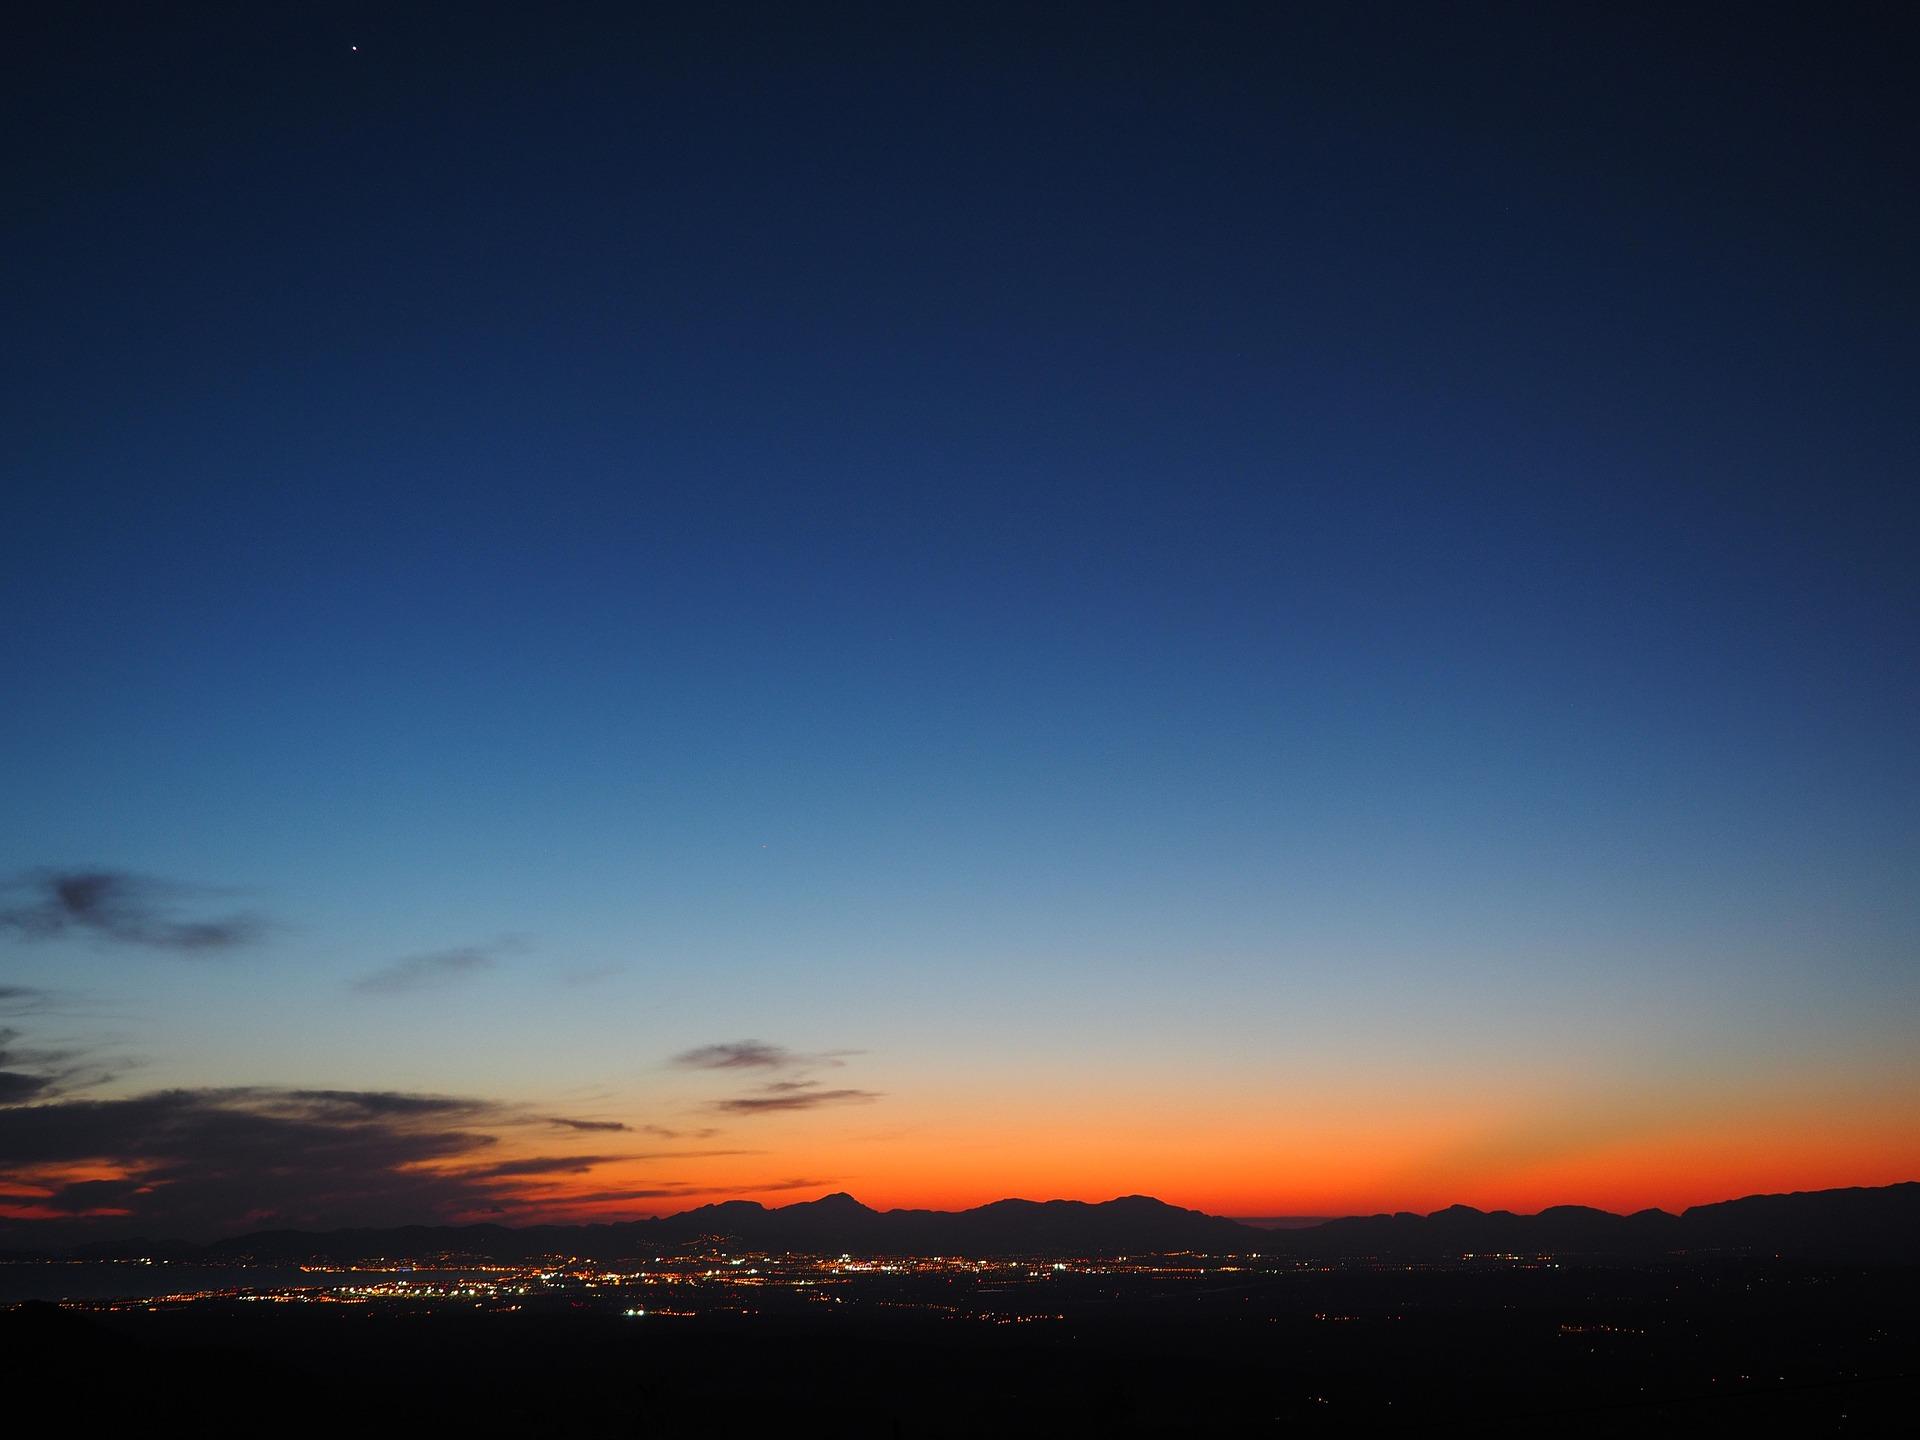 Raqqa Night Sky